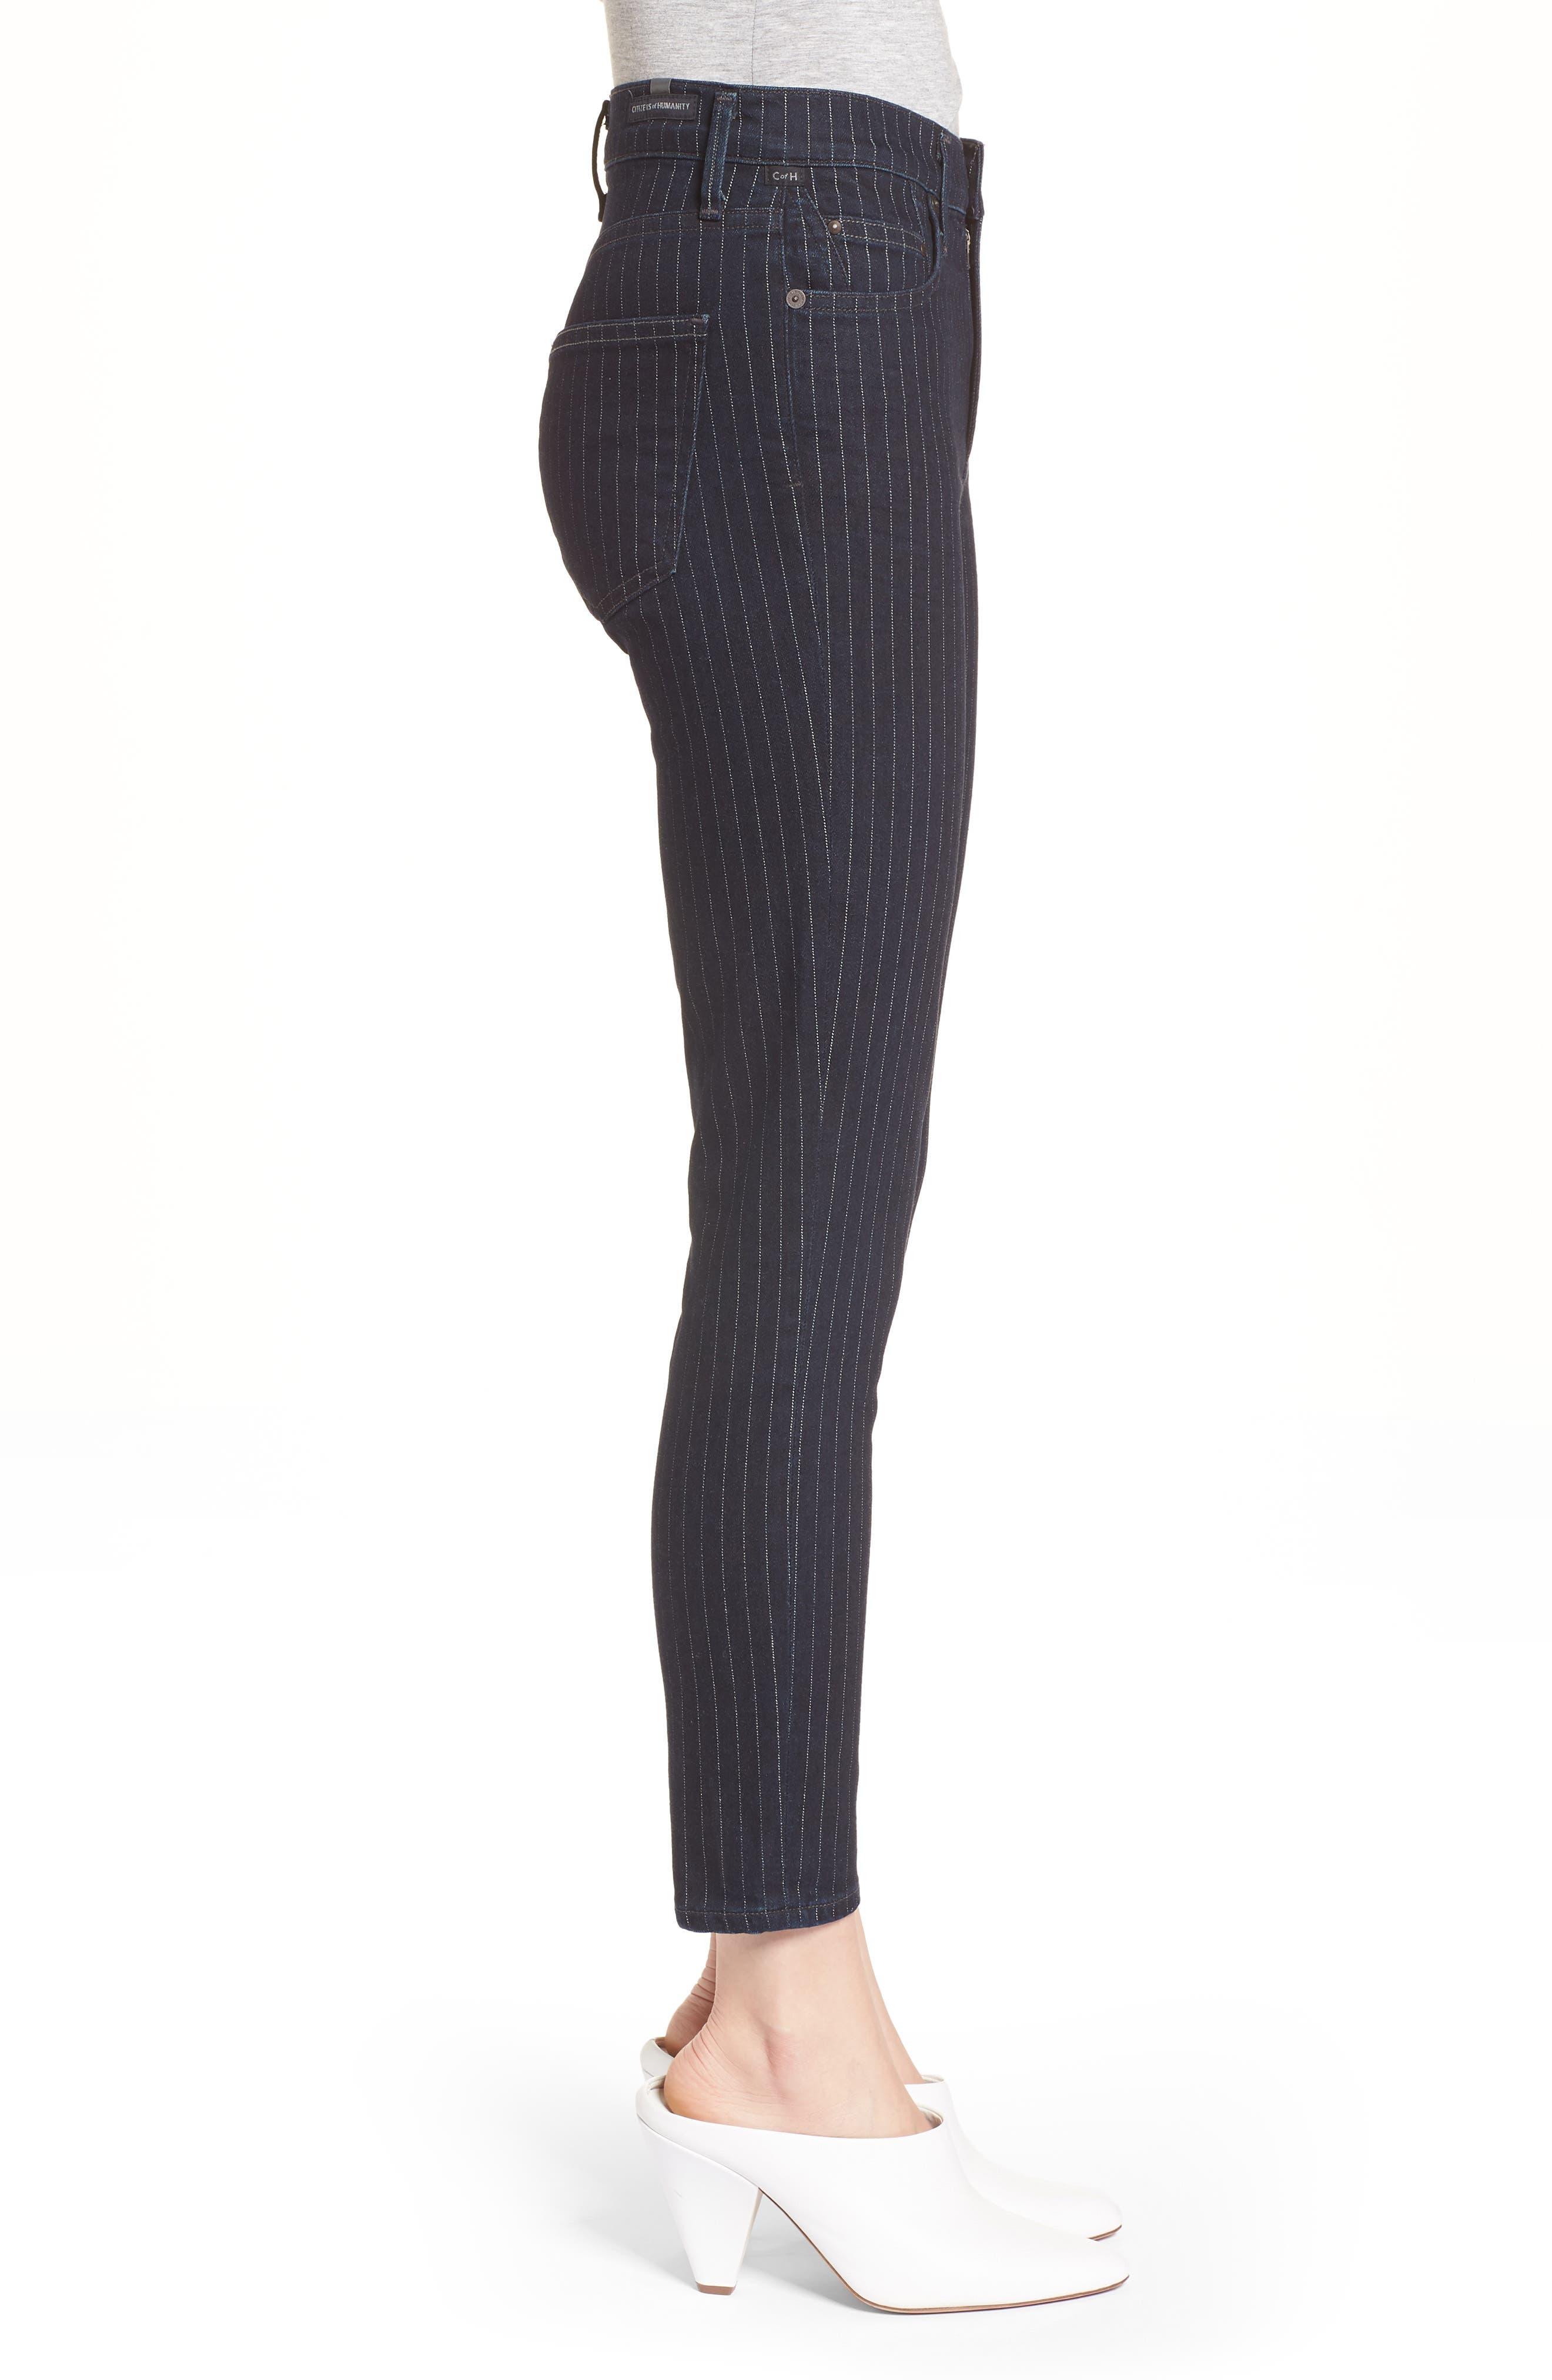 Rocket High Waist Crop Skinny Jeans,                             Alternate thumbnail 3, color,                             Pinstripe